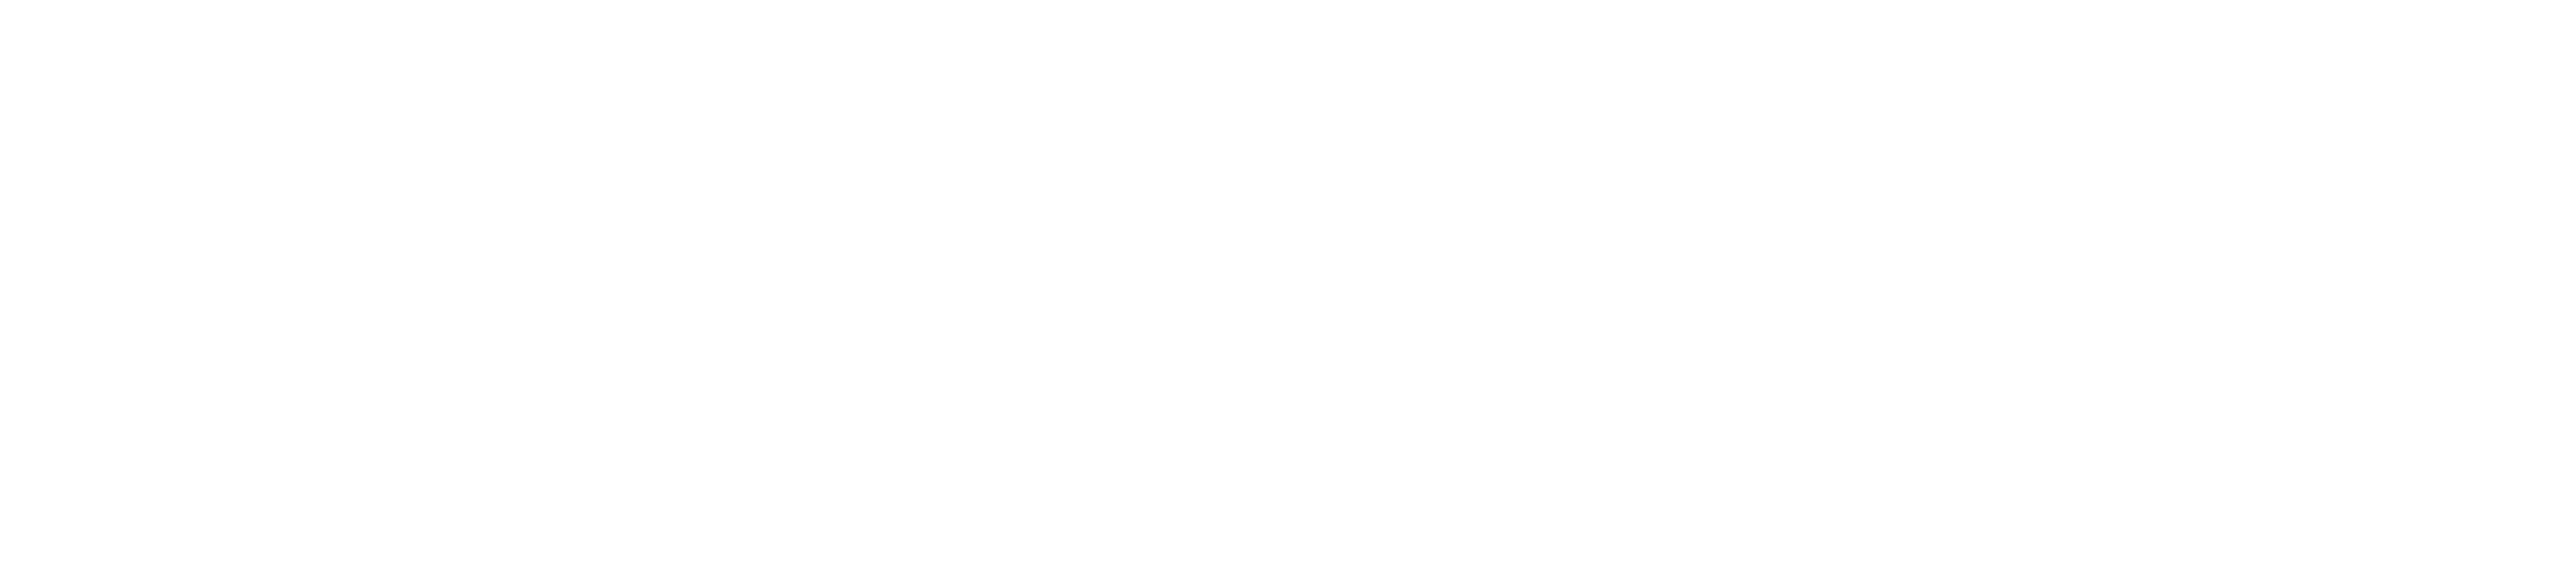 NTUC_FairPrice_logo_logotype